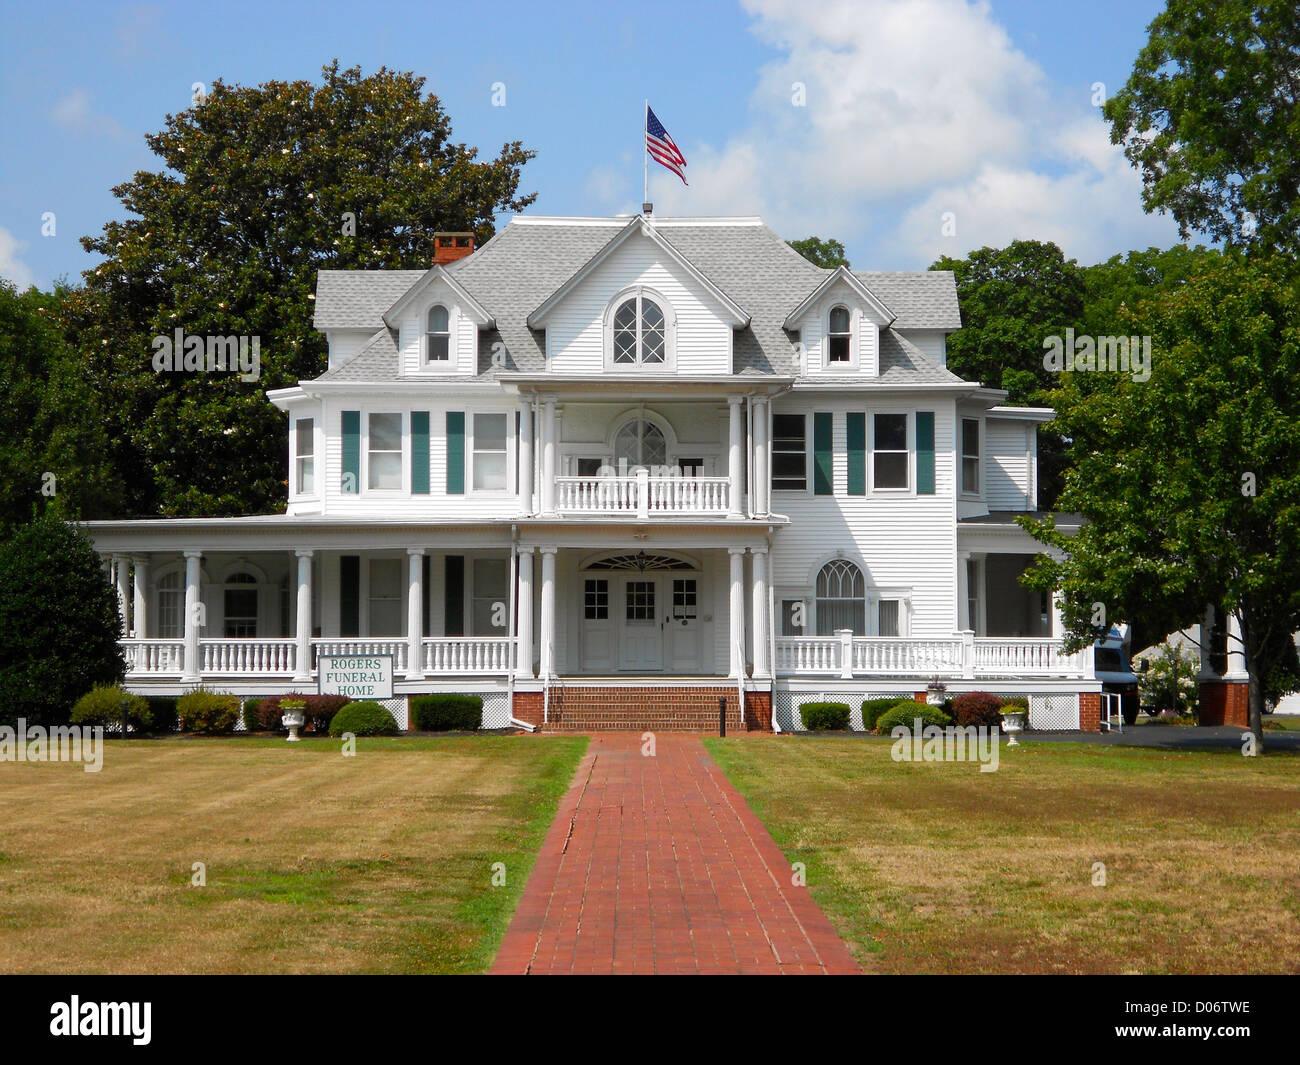 Grier Haus auf dem NRHP seit 7. Januar 1983. Bei 301 Lakeview Ave. Milford, Sussex County, Delaware. Stockbild